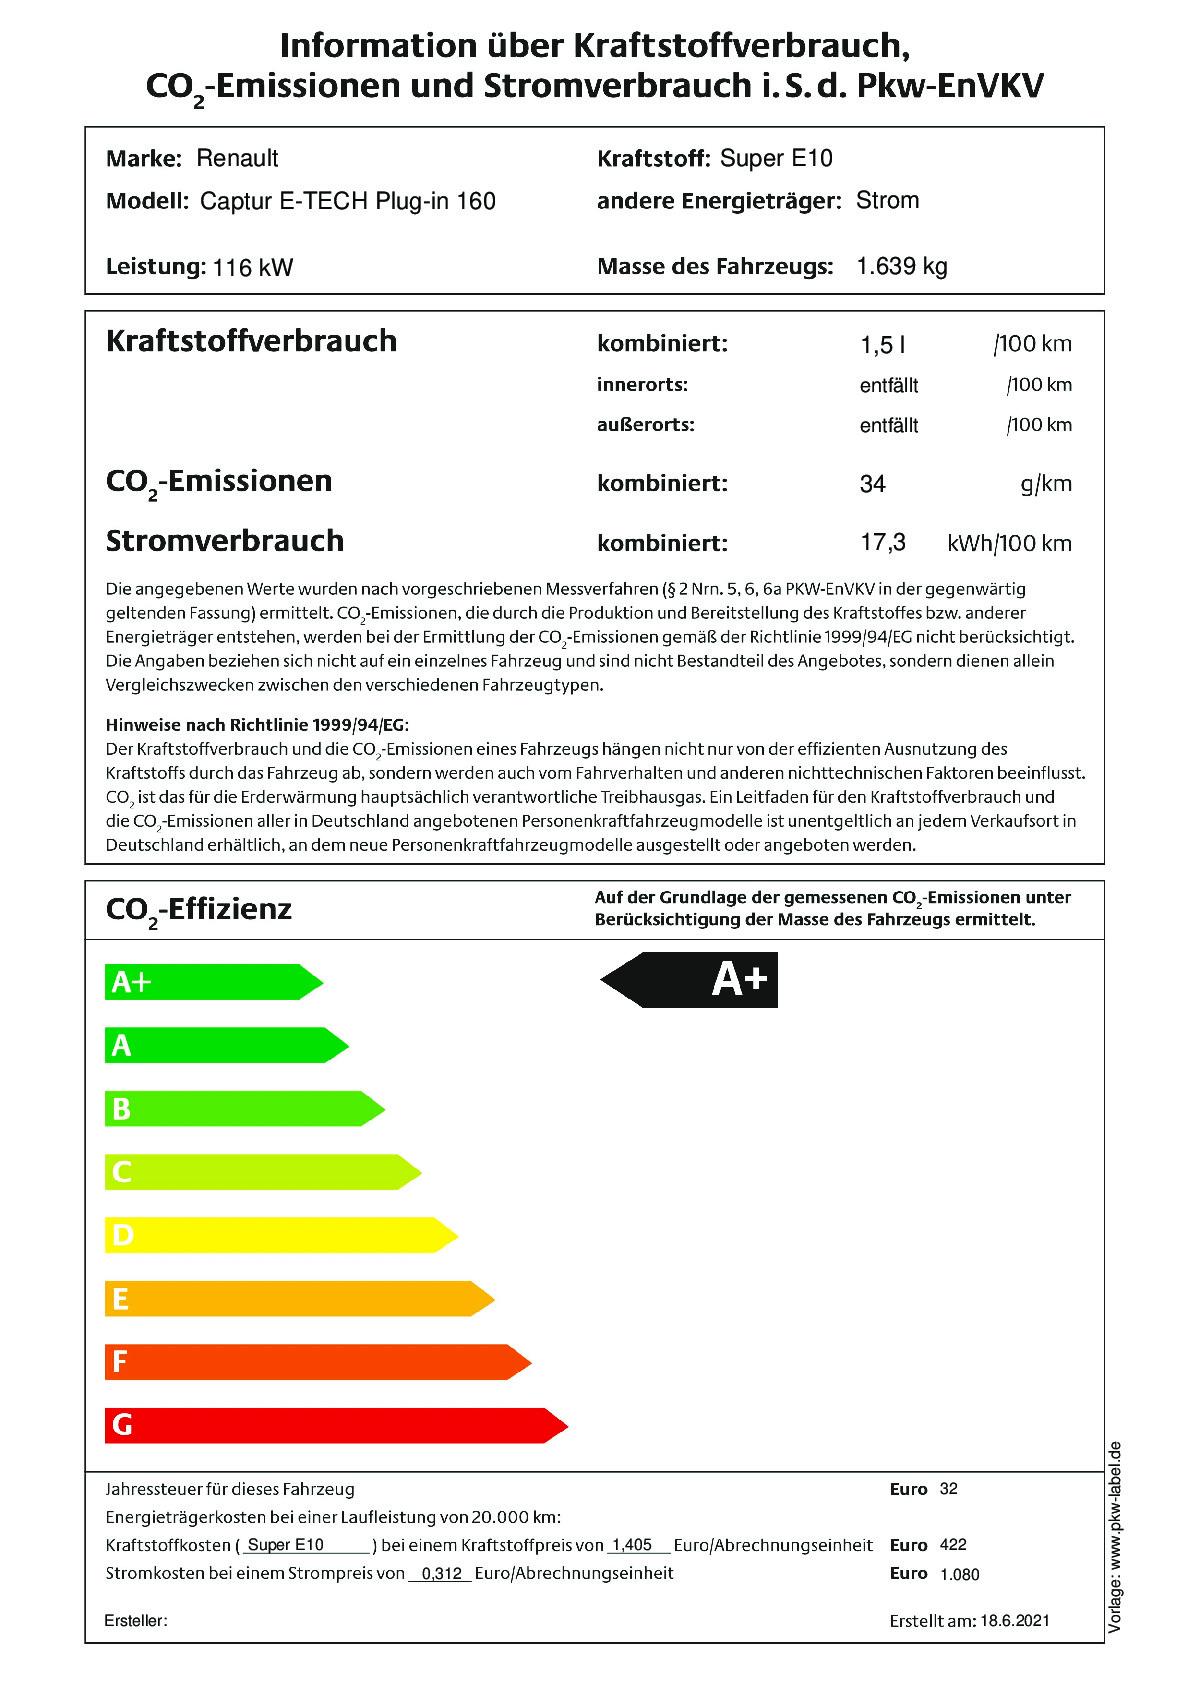 Energielabel E-TECH Plug-in 160